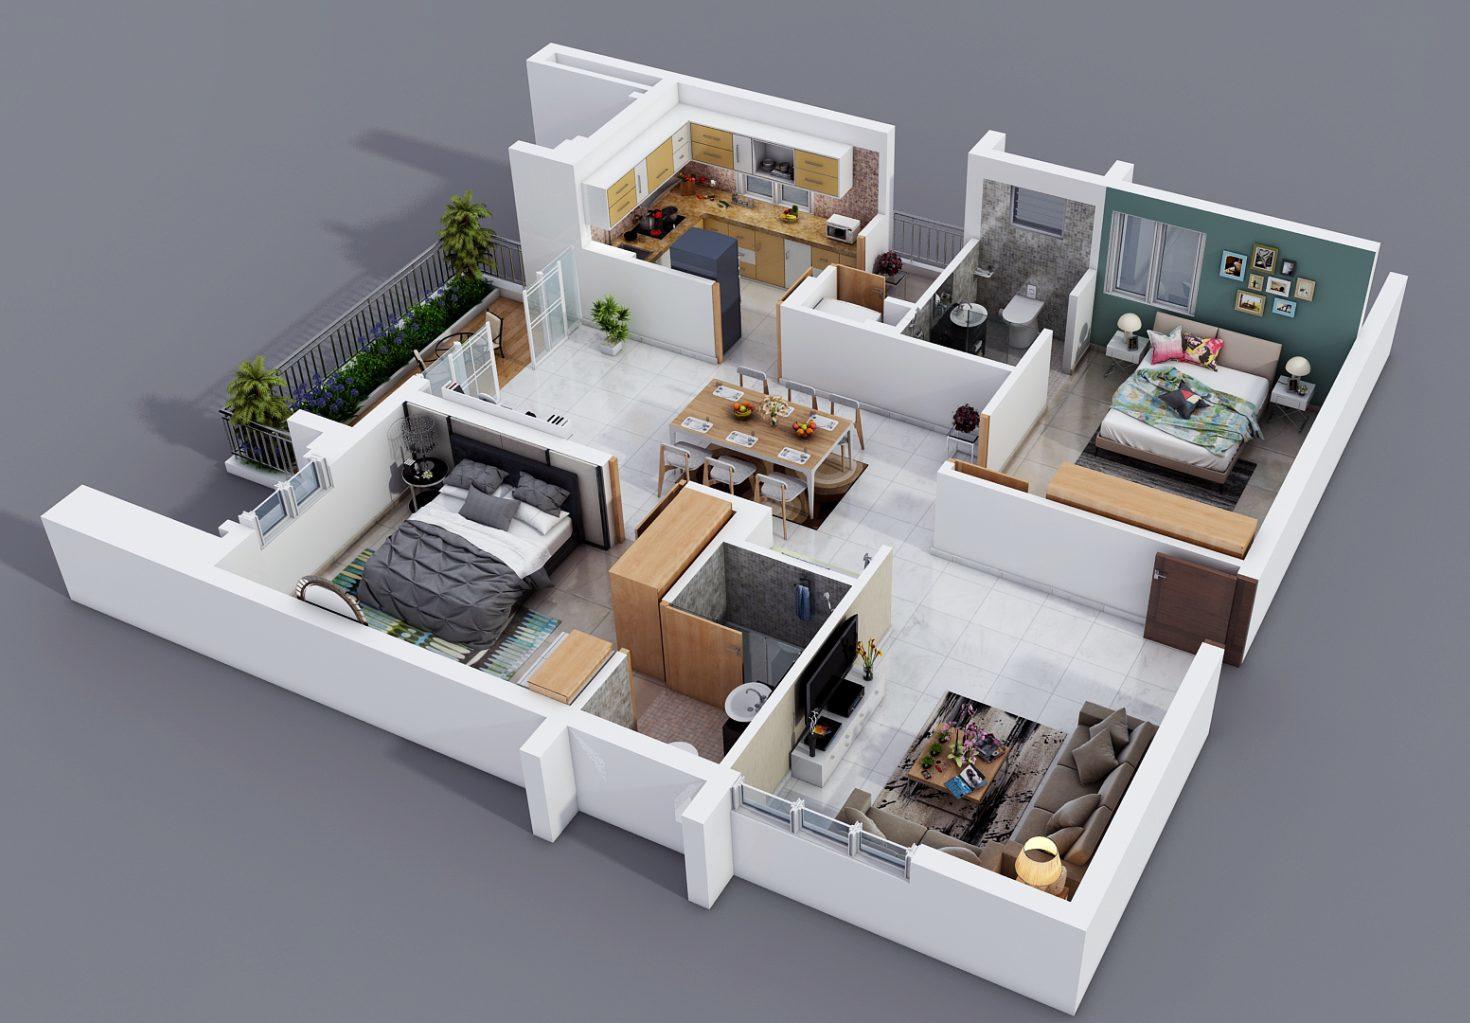 anjani pearl towers apartment 2bhk 1390sqft01